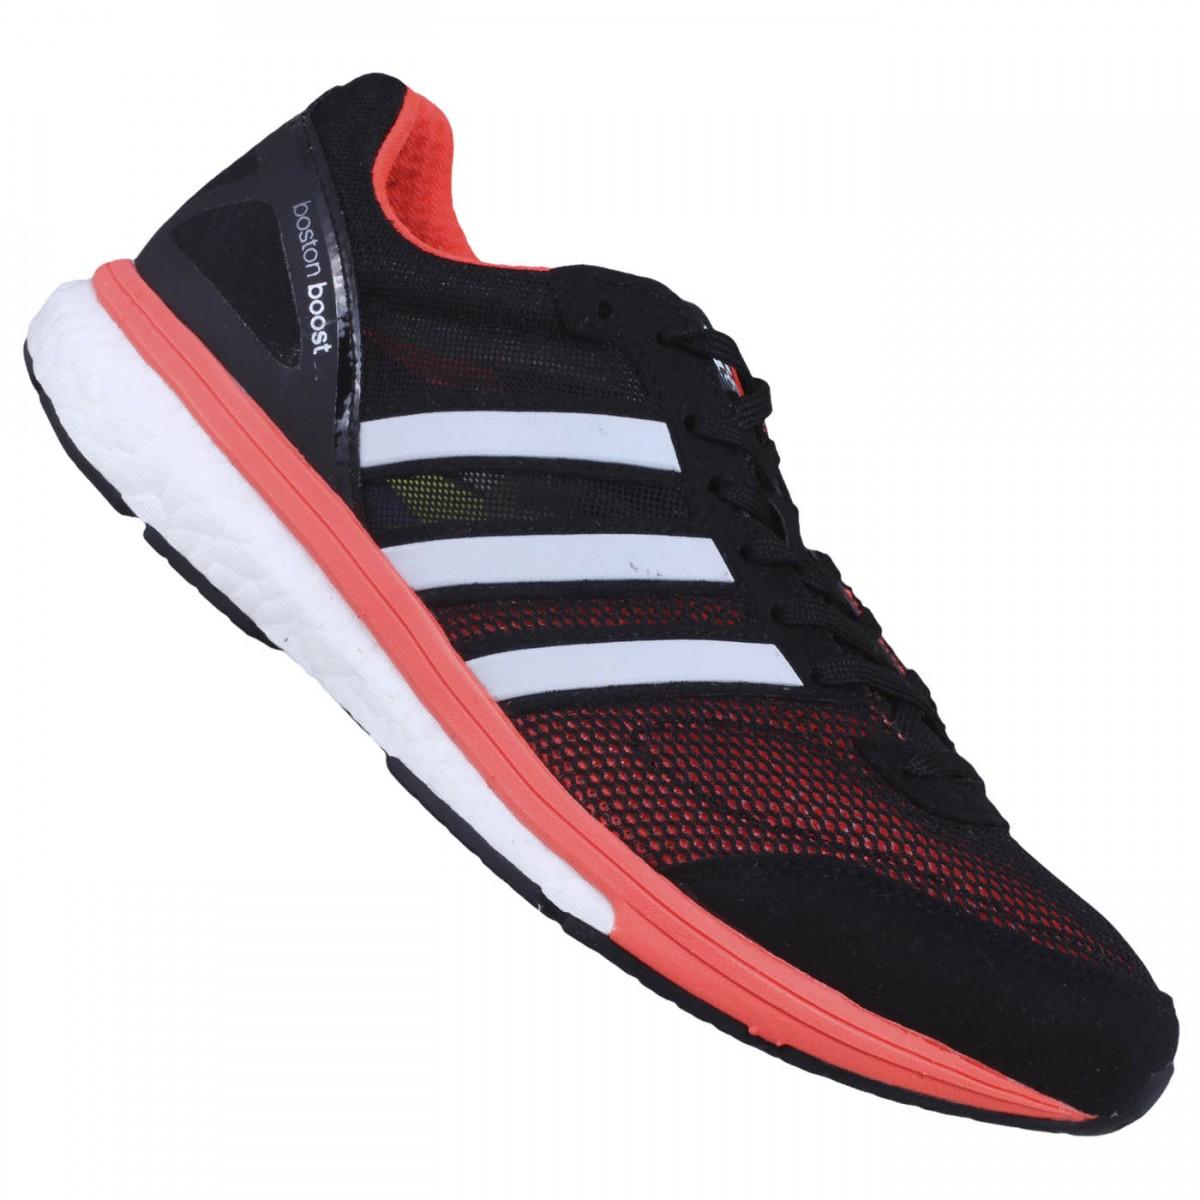 Tênis Adidas Adizero Boston Boost 6 - Masculino  8539fbeb7f75d